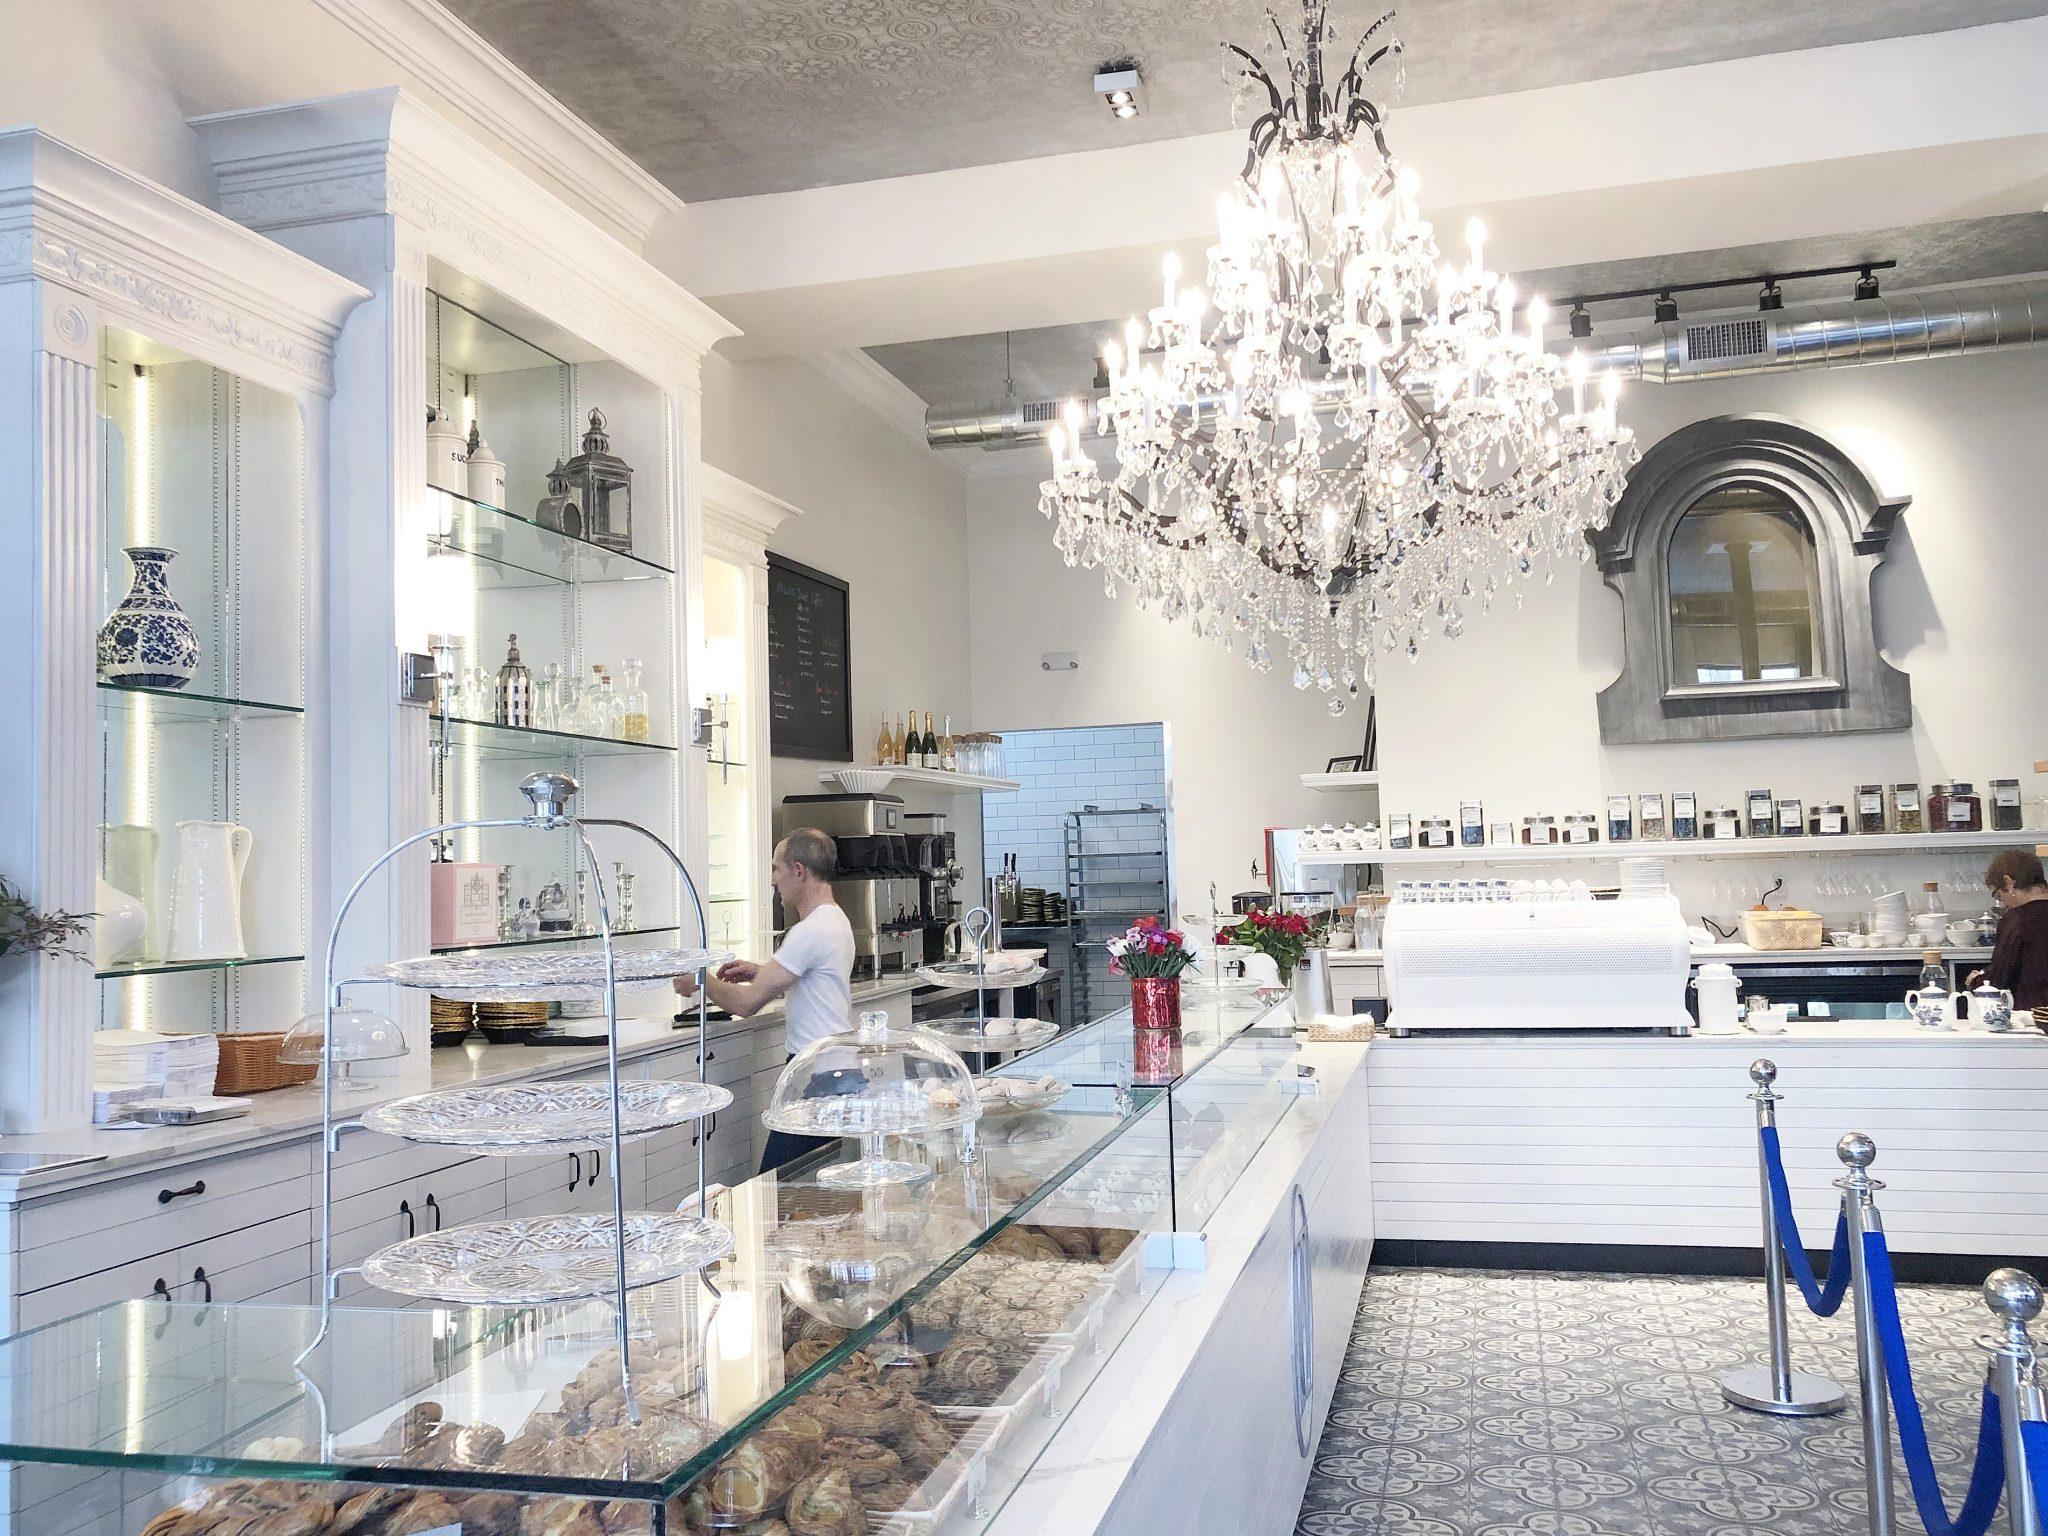 Maison Danel: a new French tea salon-pâtisserie in San Francisco